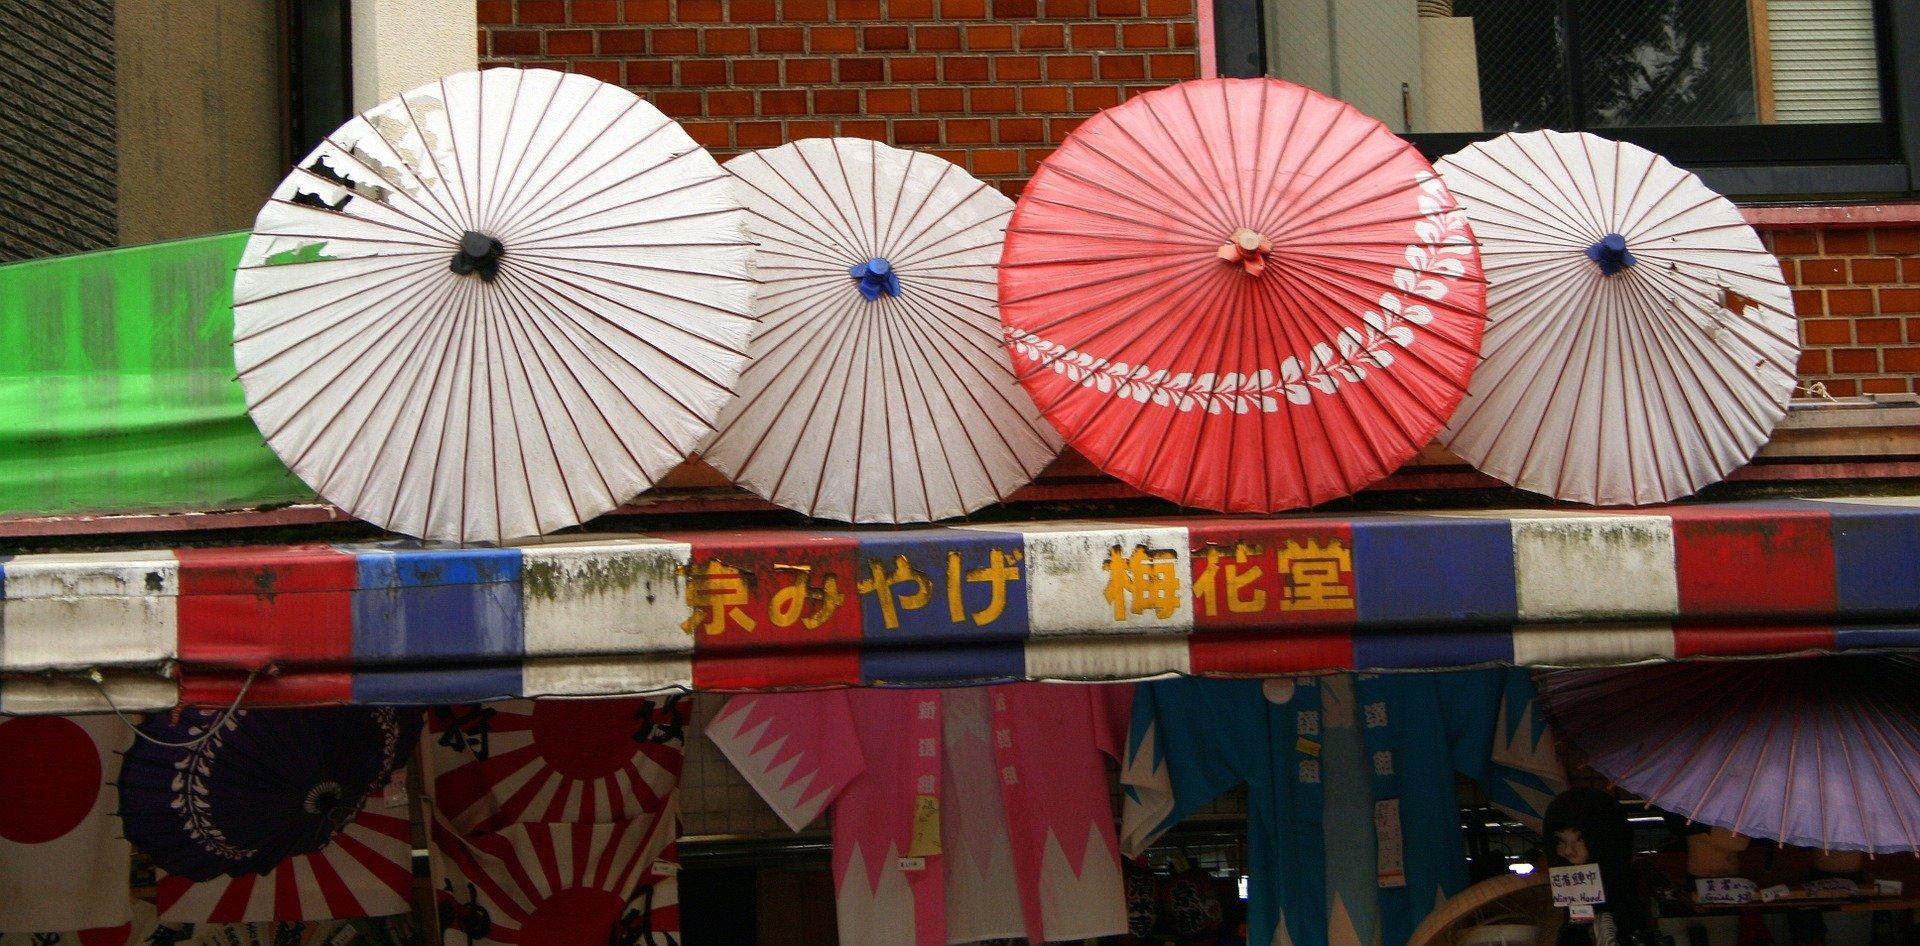 Sumo, Shrines, Sake and Joy for Your Senses